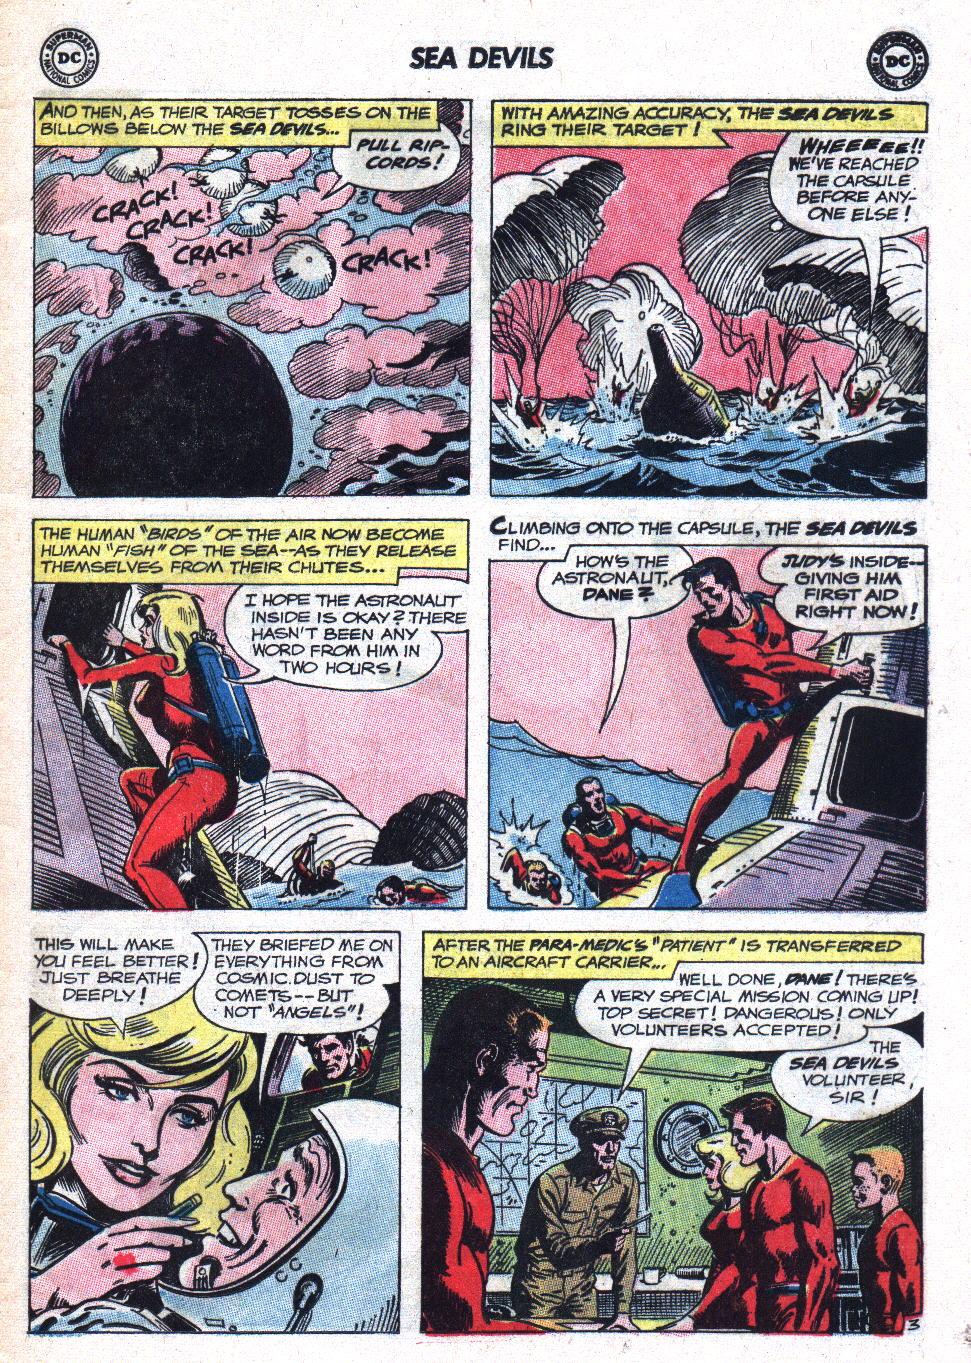 Read online Sea Devils comic -  Issue #9 - 6